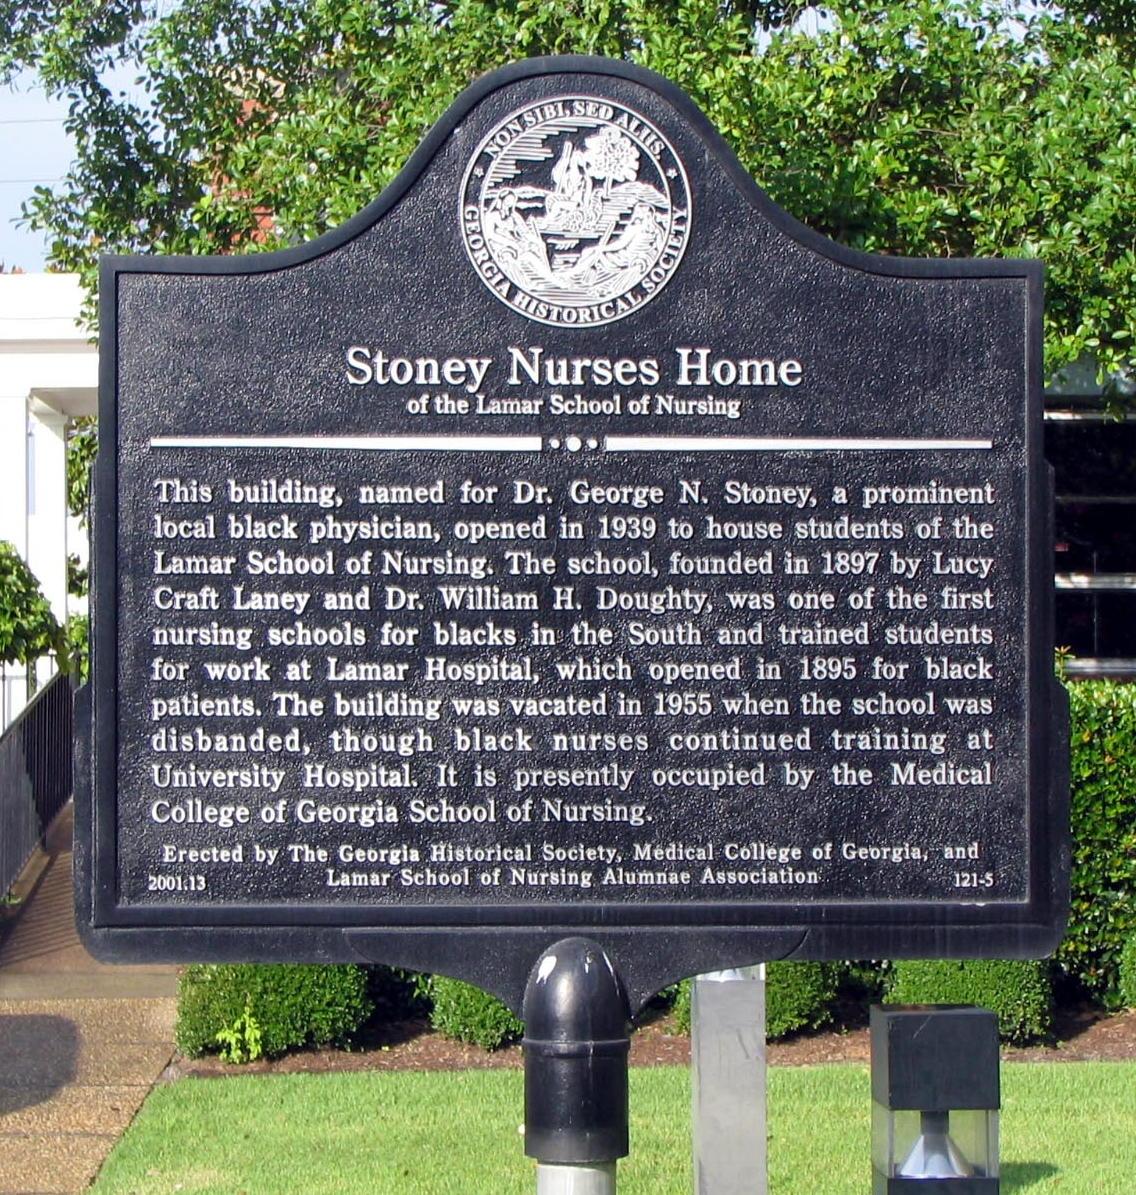 Stoney Nurses Home of the Lamar School of Nursing ...